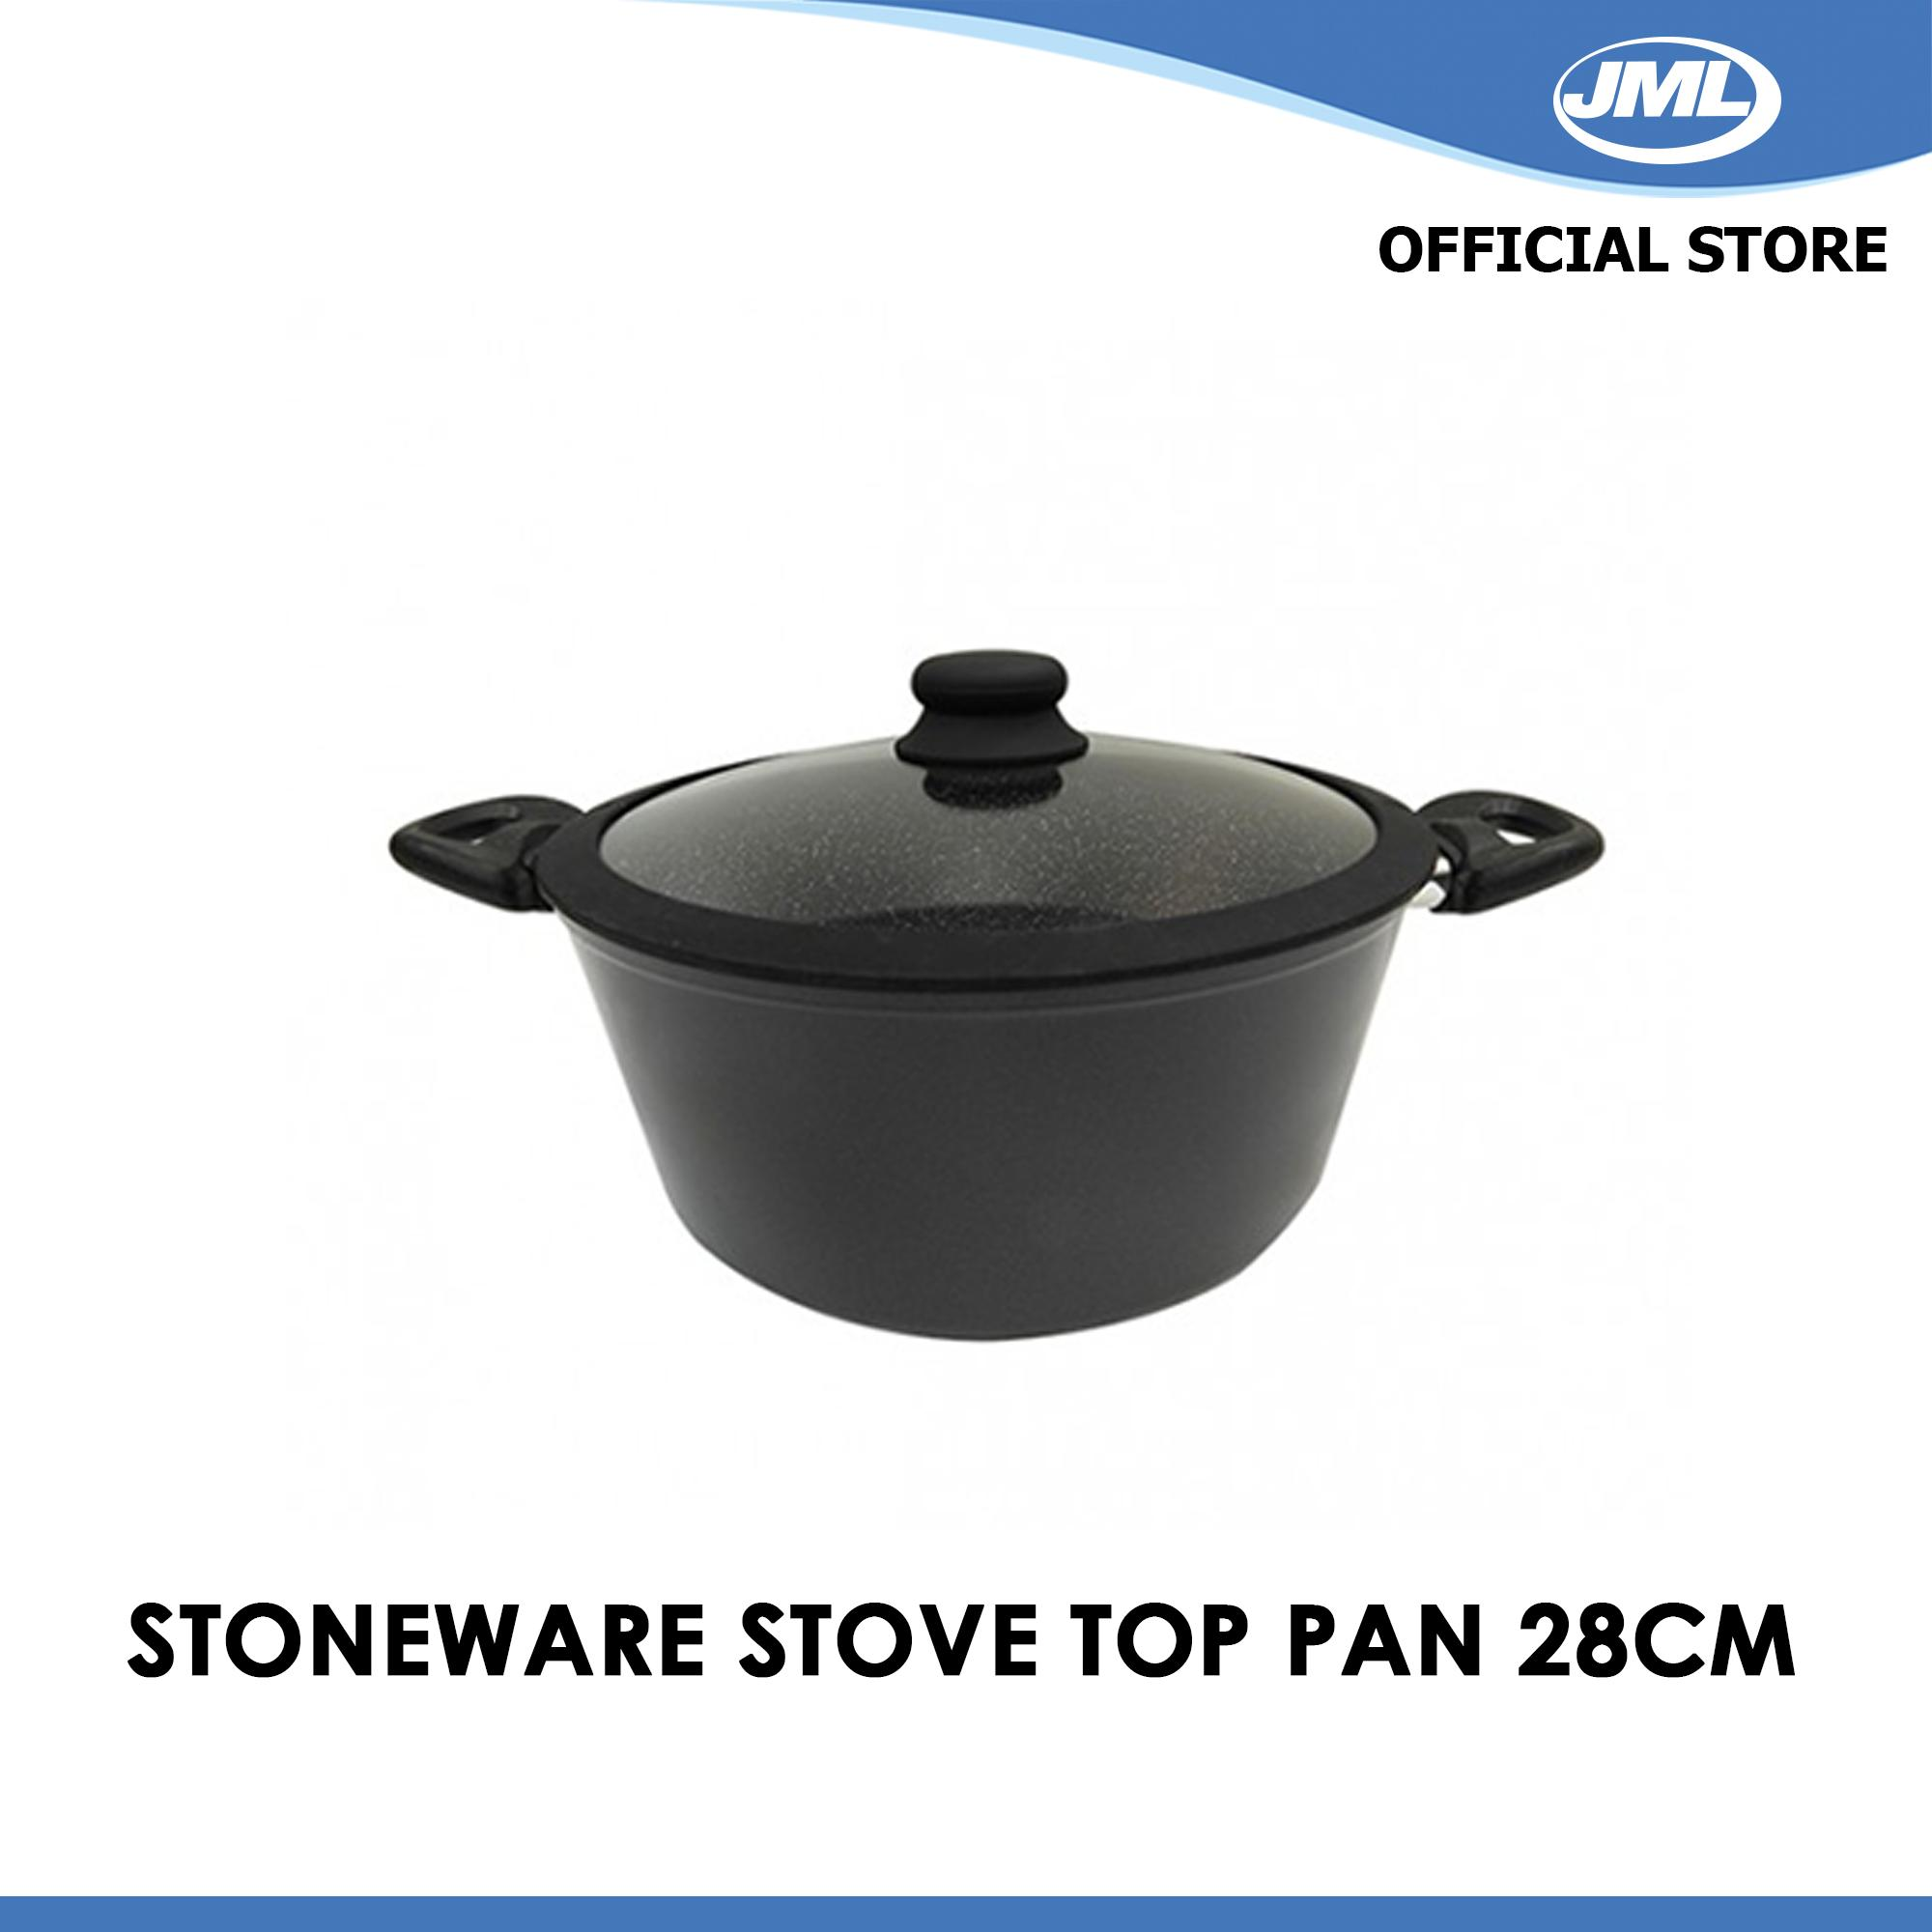 Jml Copper Stone Pan Reviews Bruin Blog